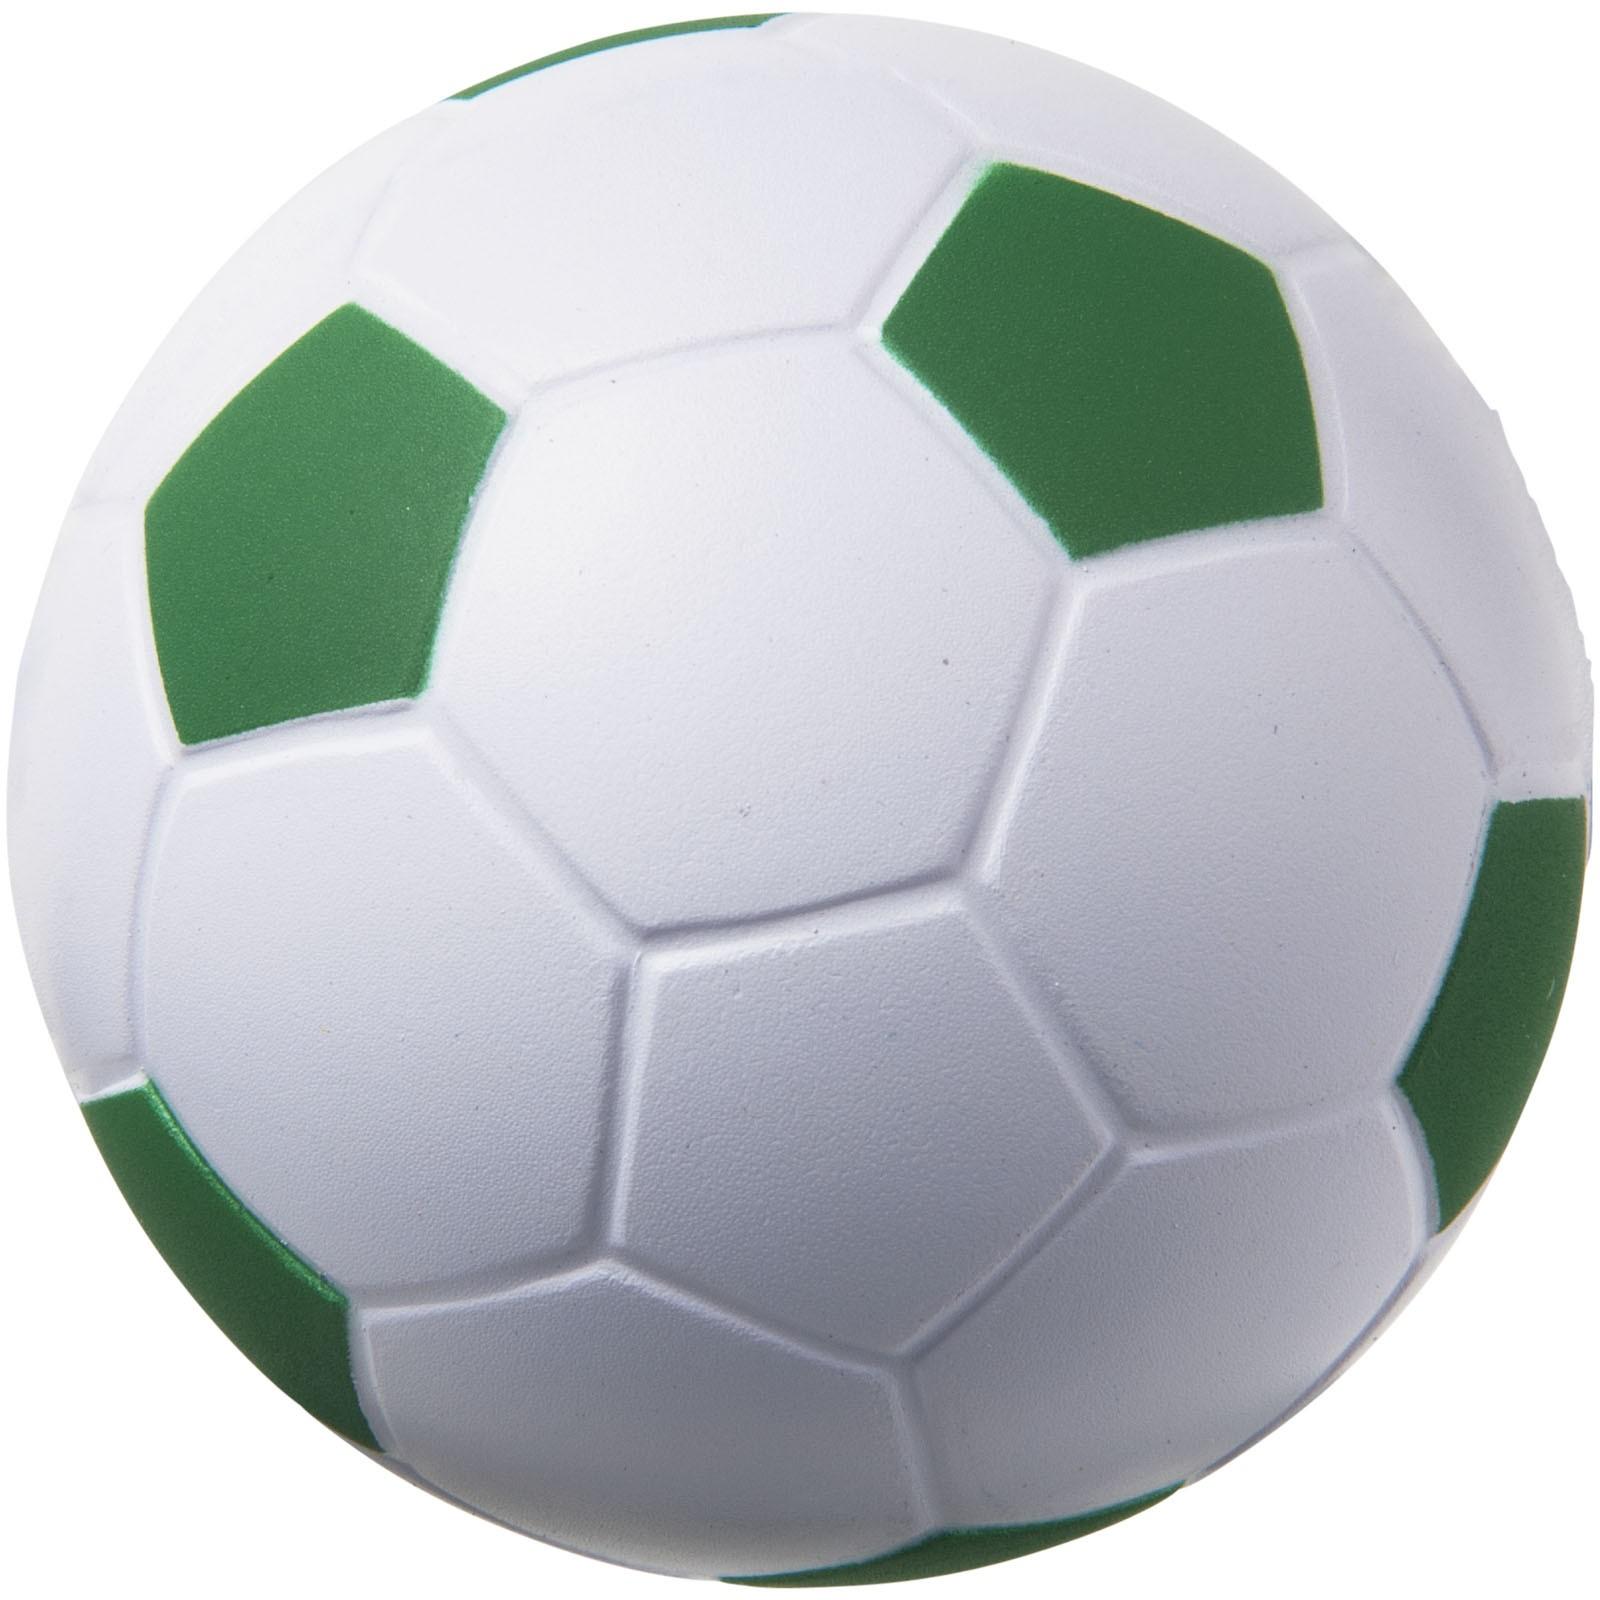 Antistresový míč Football - Zelená / Bílá